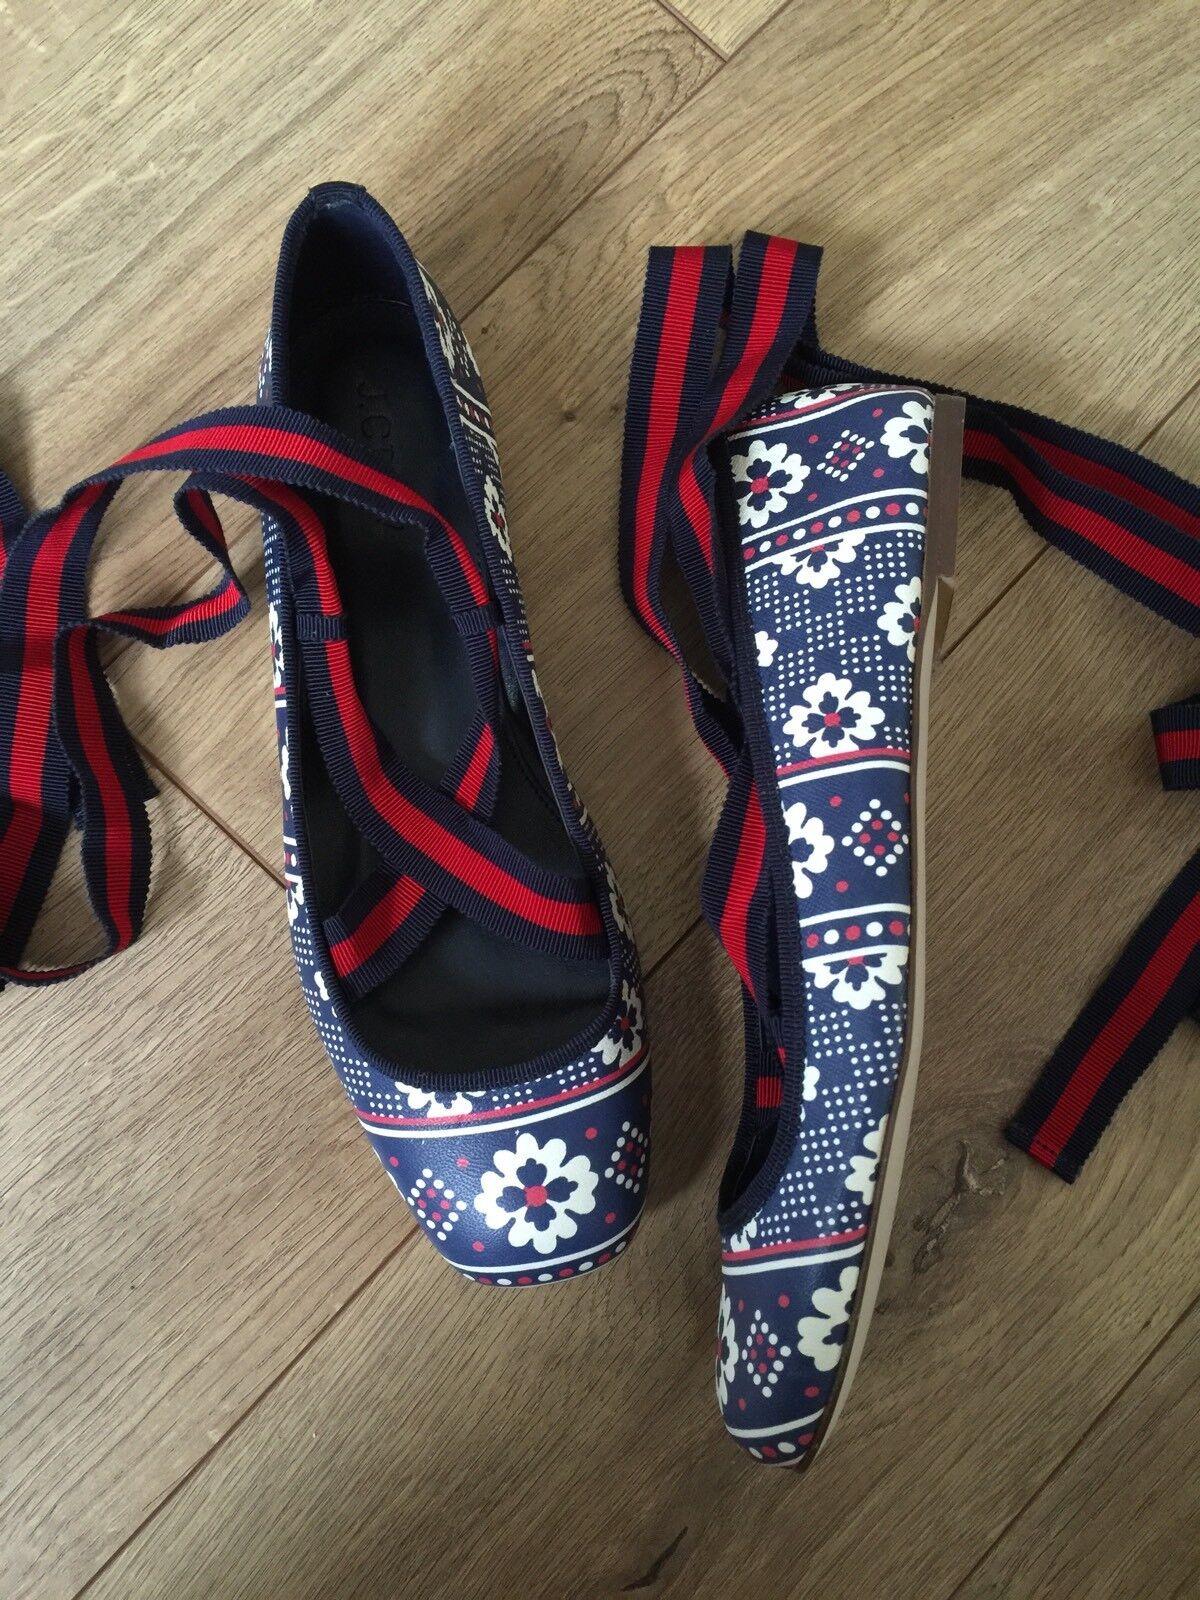 presa di marca JCrew  168 168 168 Lily Lace-Up Ballet Flats Sz 8 Vintage Indigo blu G7854 scarpe  economico